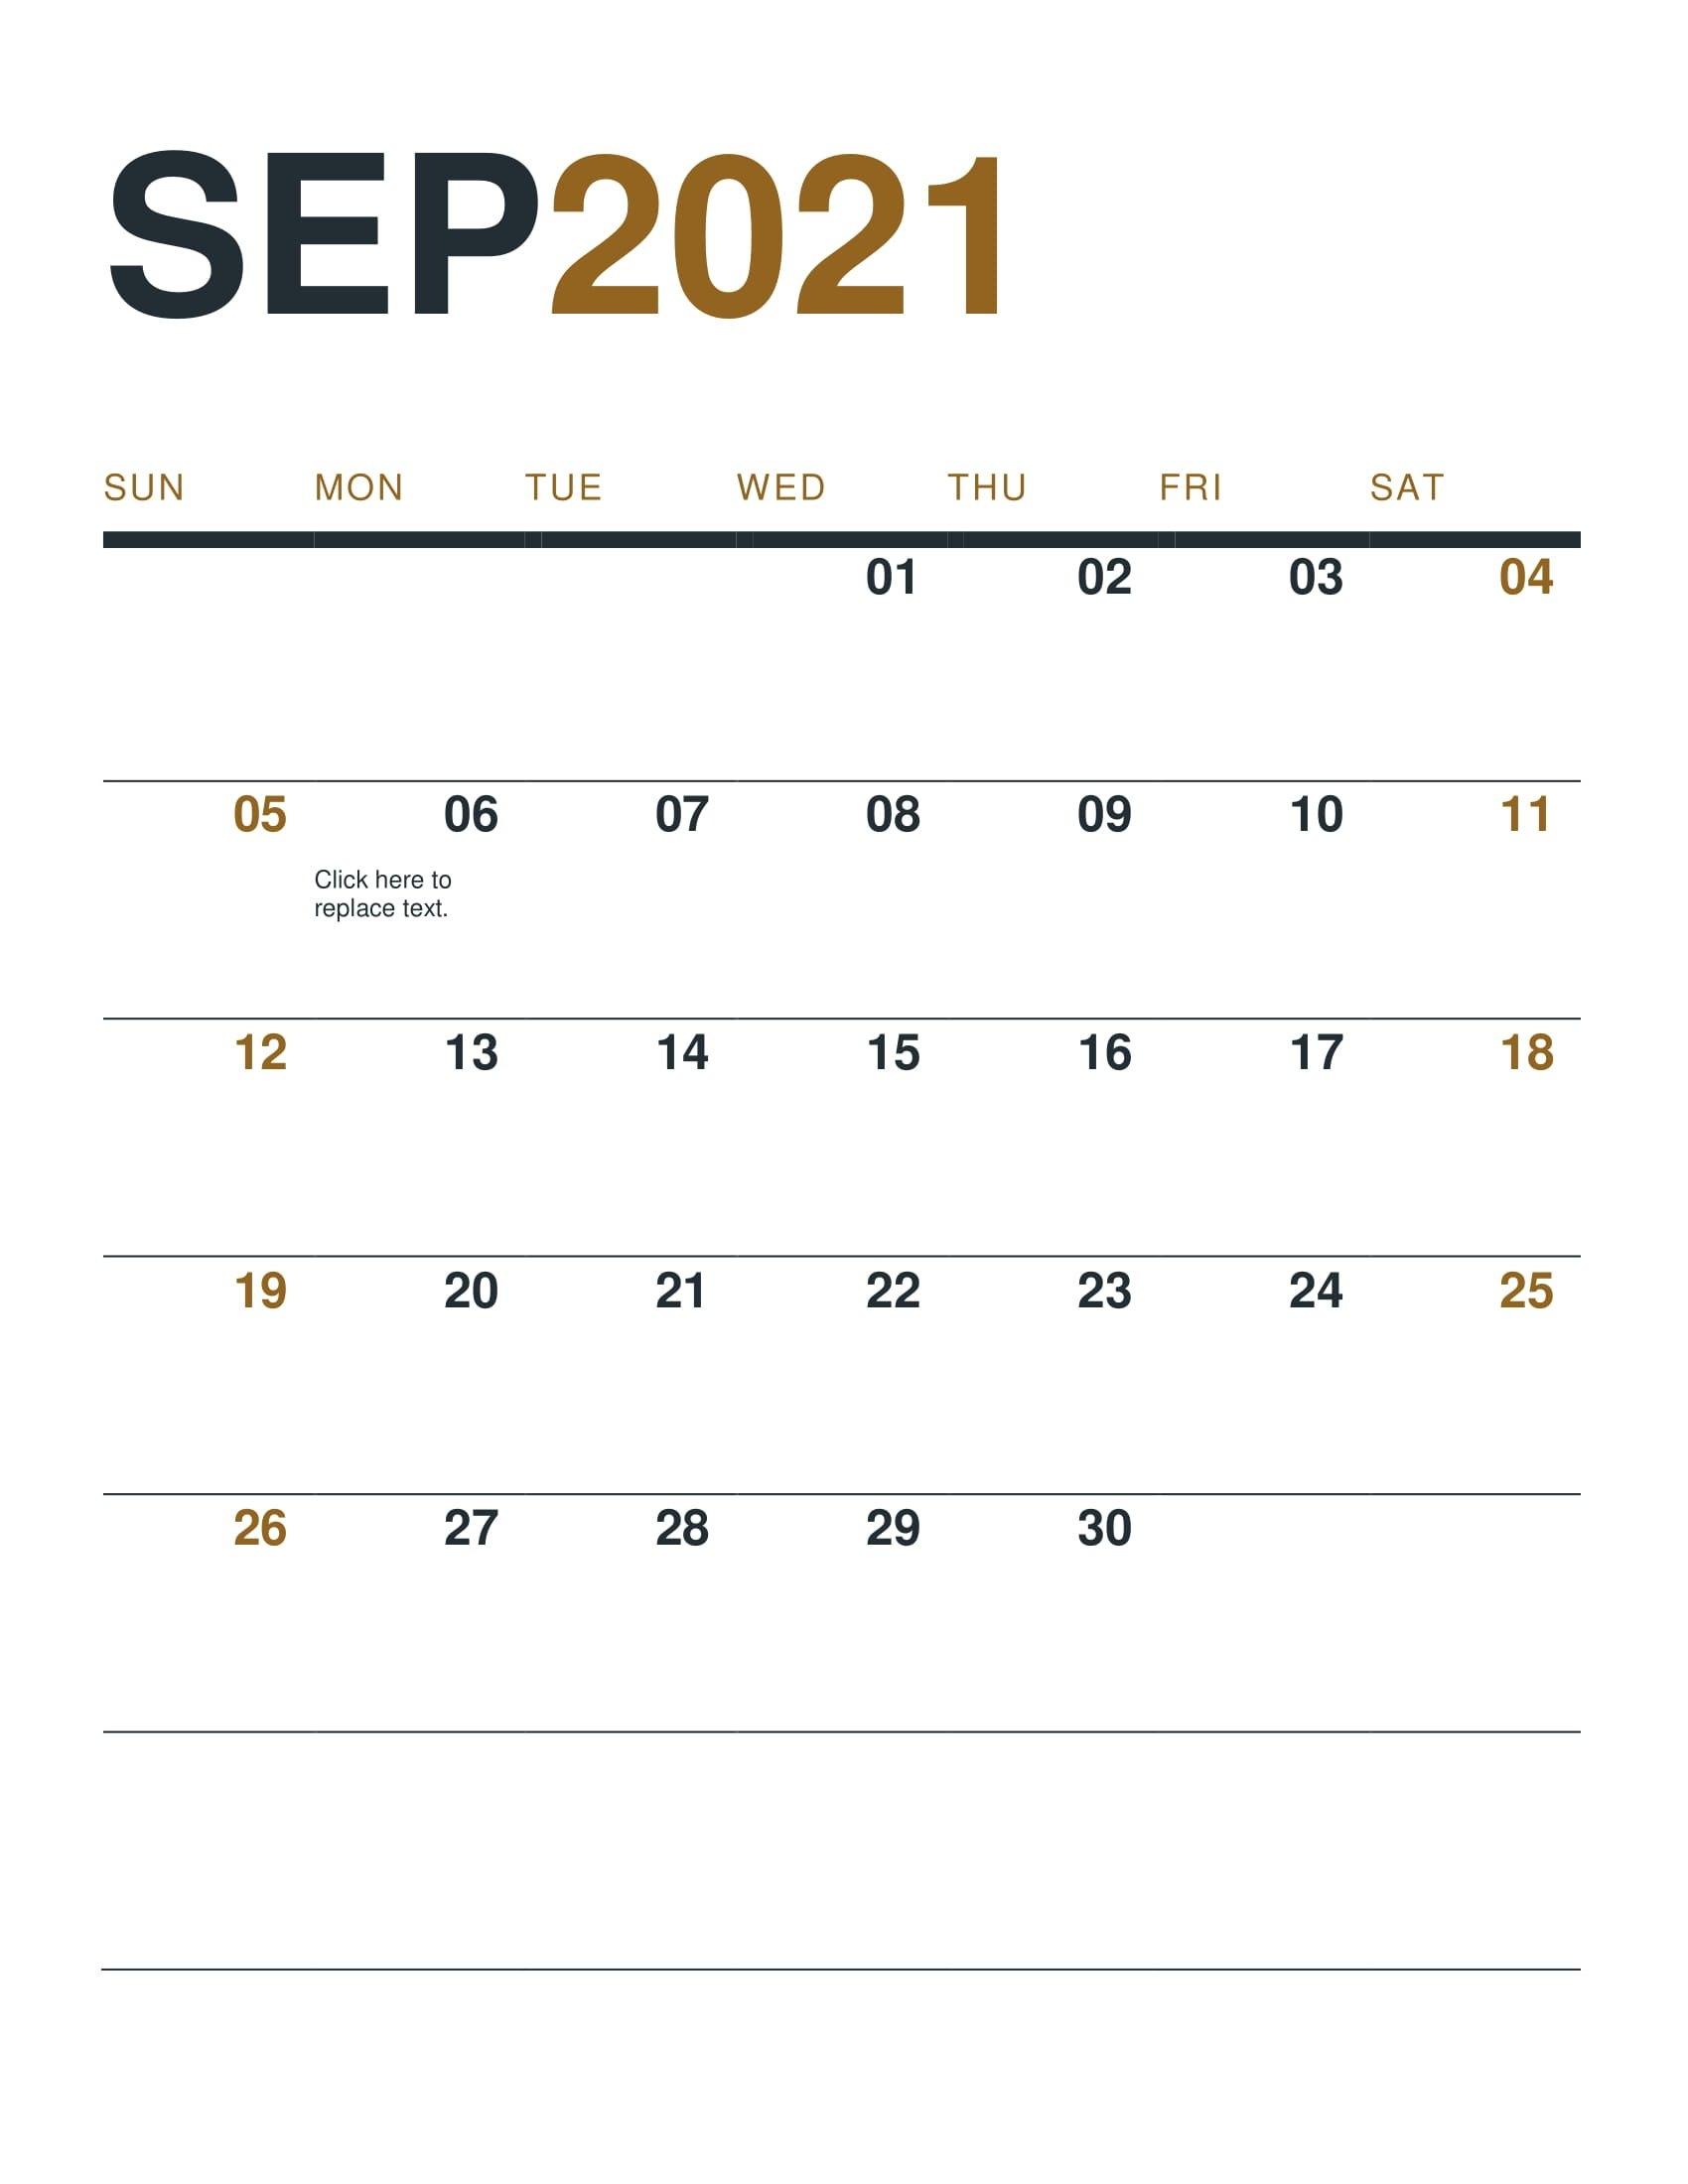 September Calendar 2021 - Printable Calendar Template 2020 2021 within Excel September 2021 Monthly Planner Template